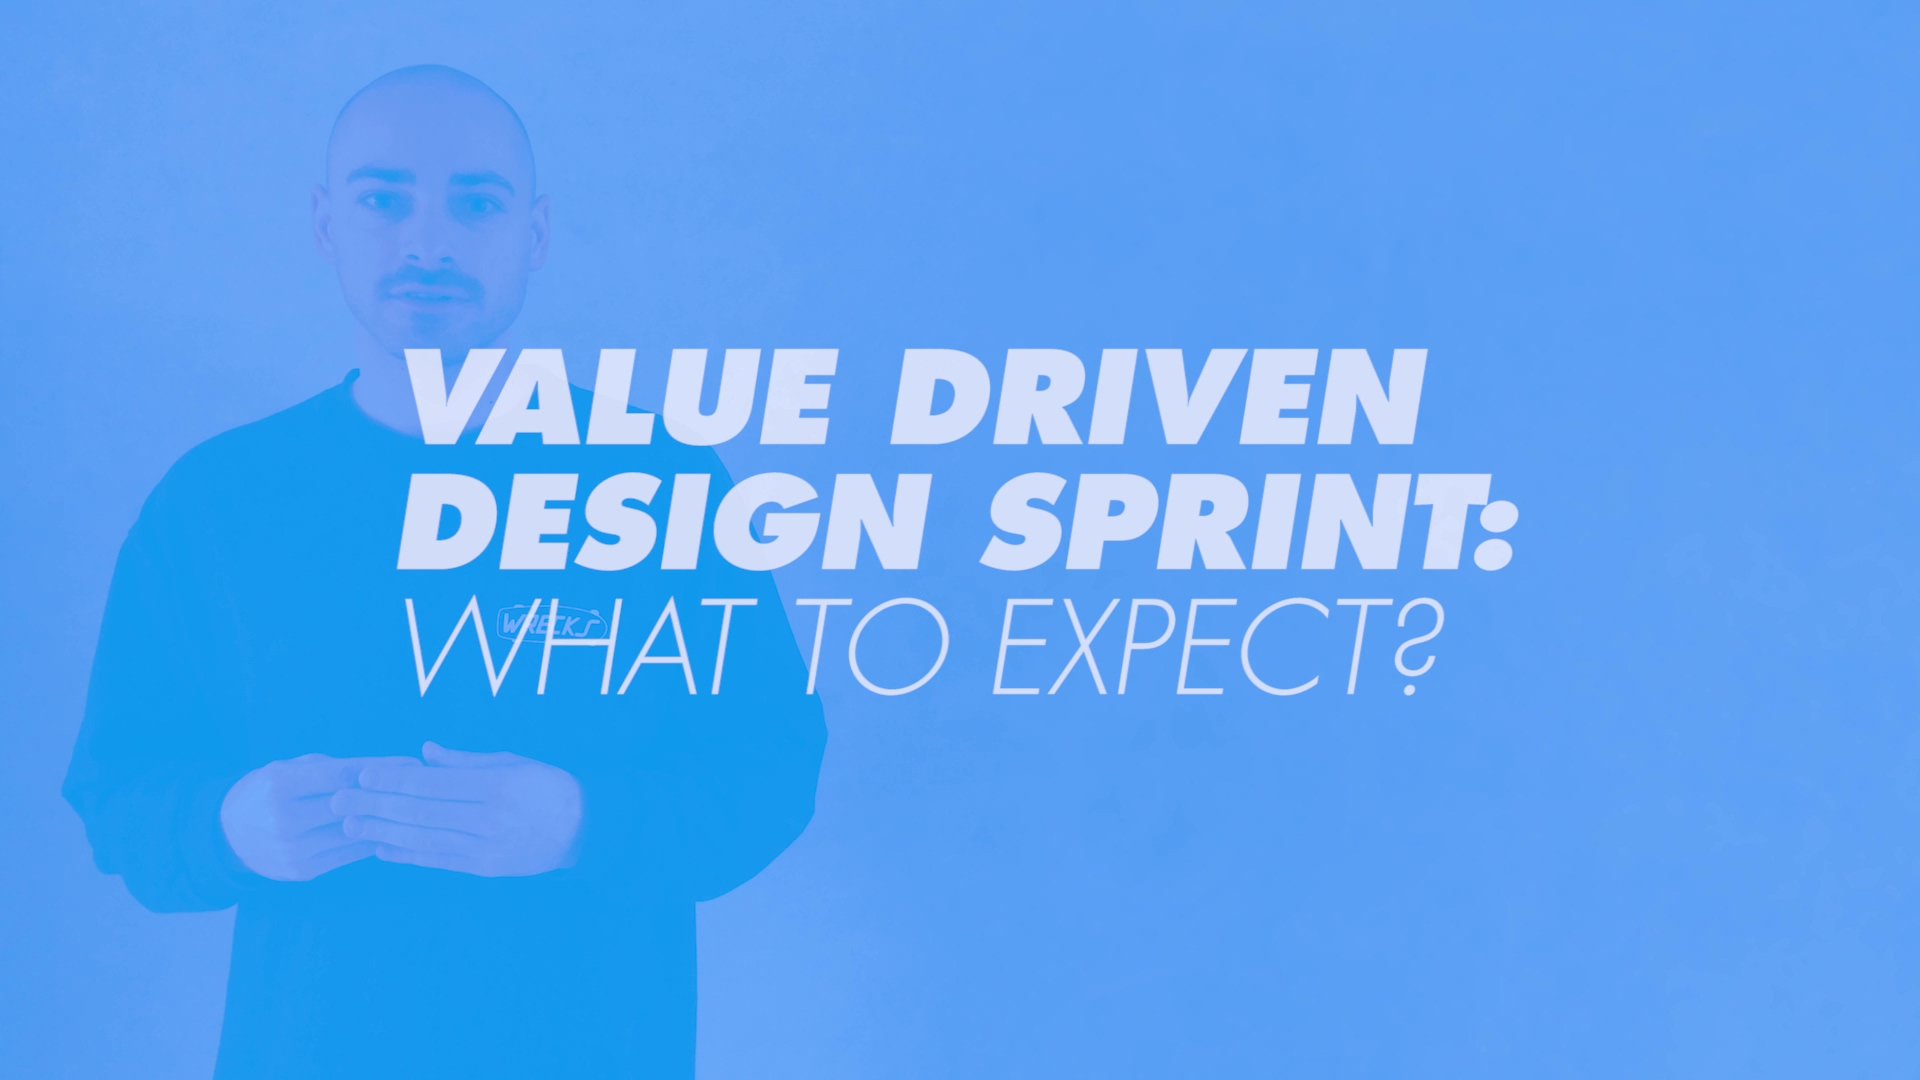 202012_Osudio_ALL_video_Mitchel_Value_driven_design_sprint-04